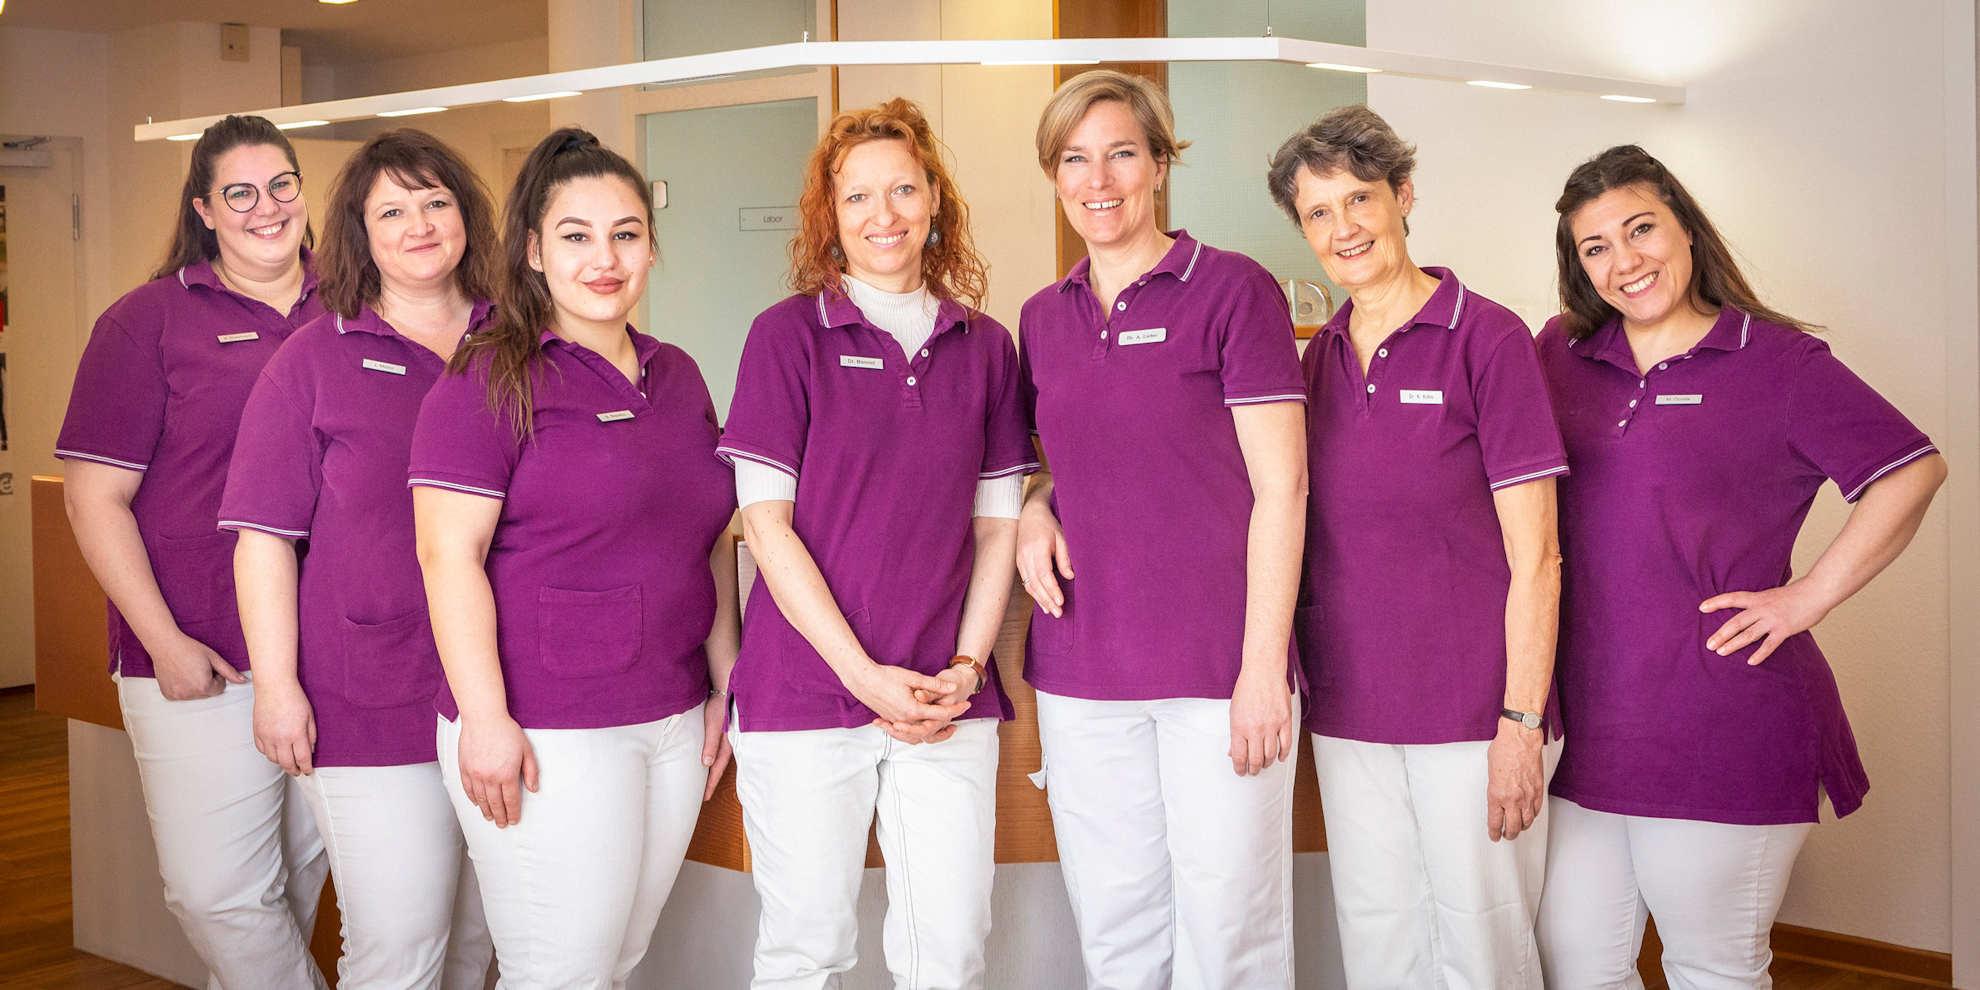 Team der Frauenarzt-Praxis Dr. Lieber in Tübingen